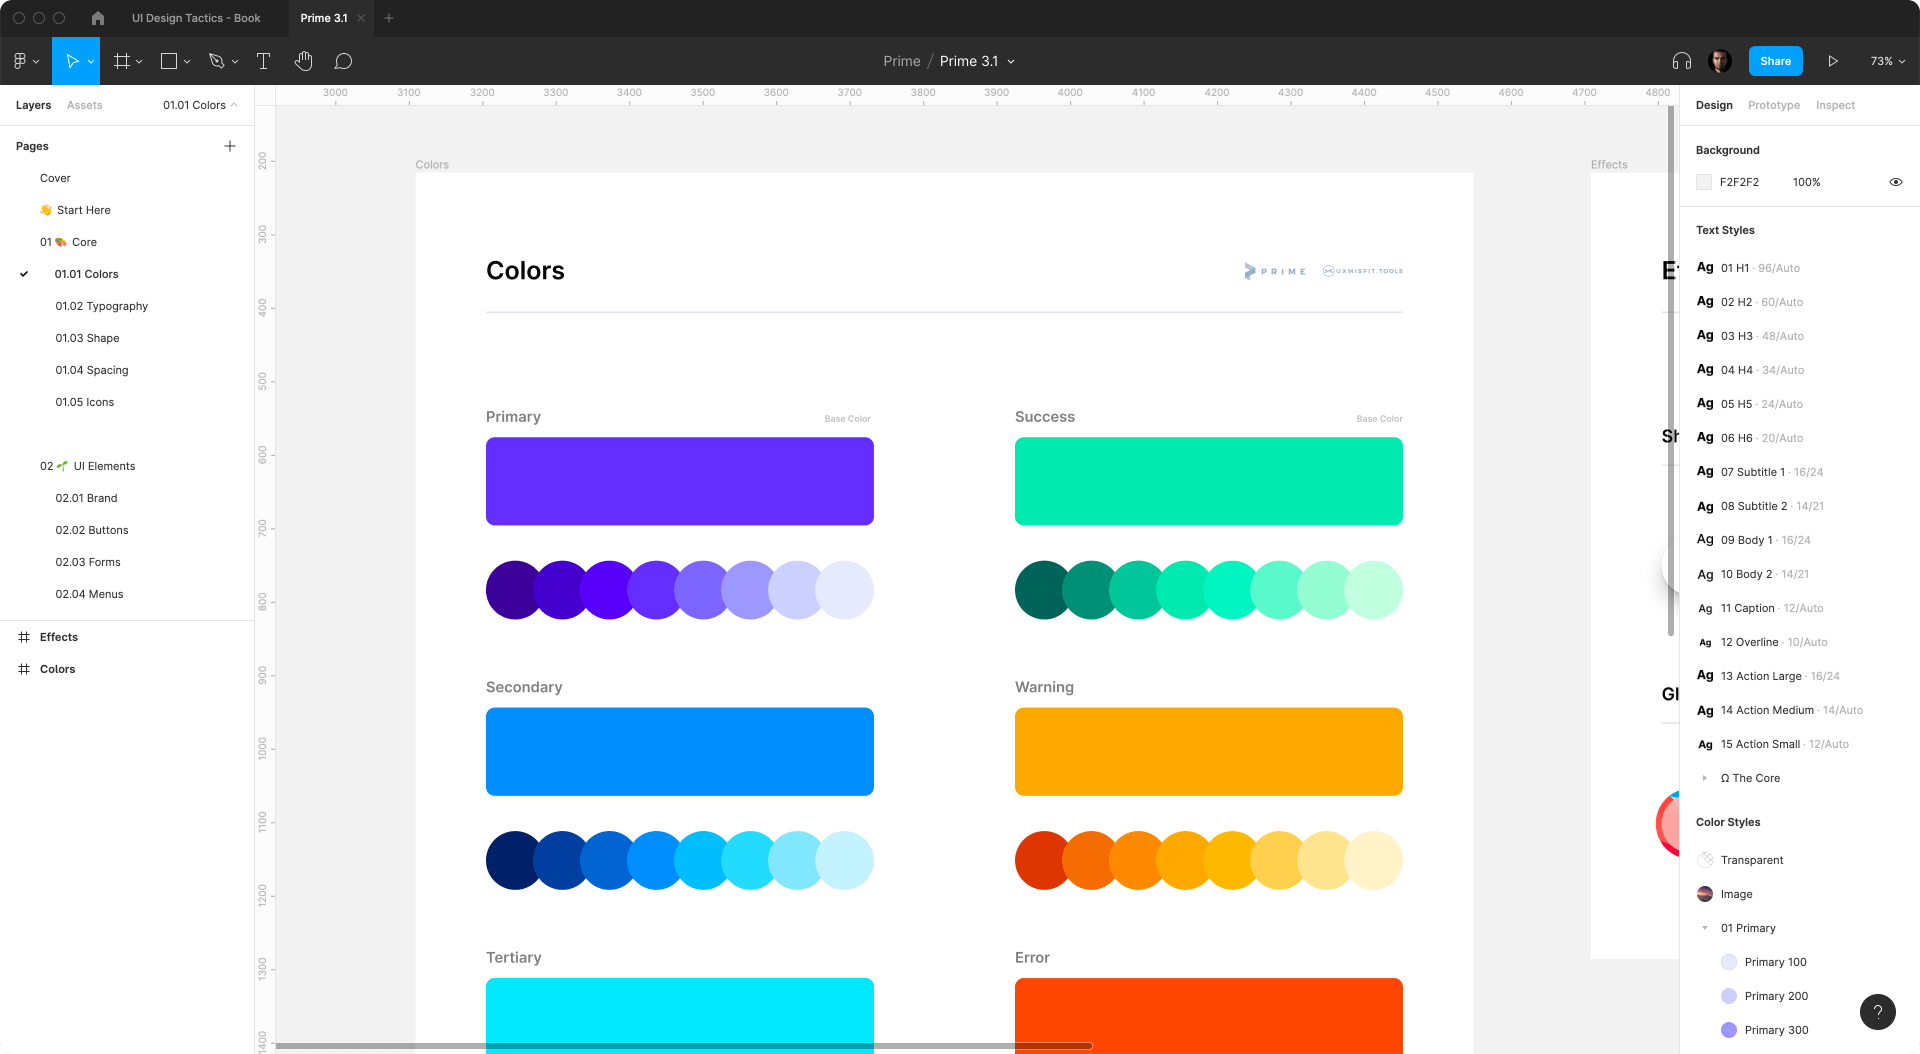 Prime 3 figma colors